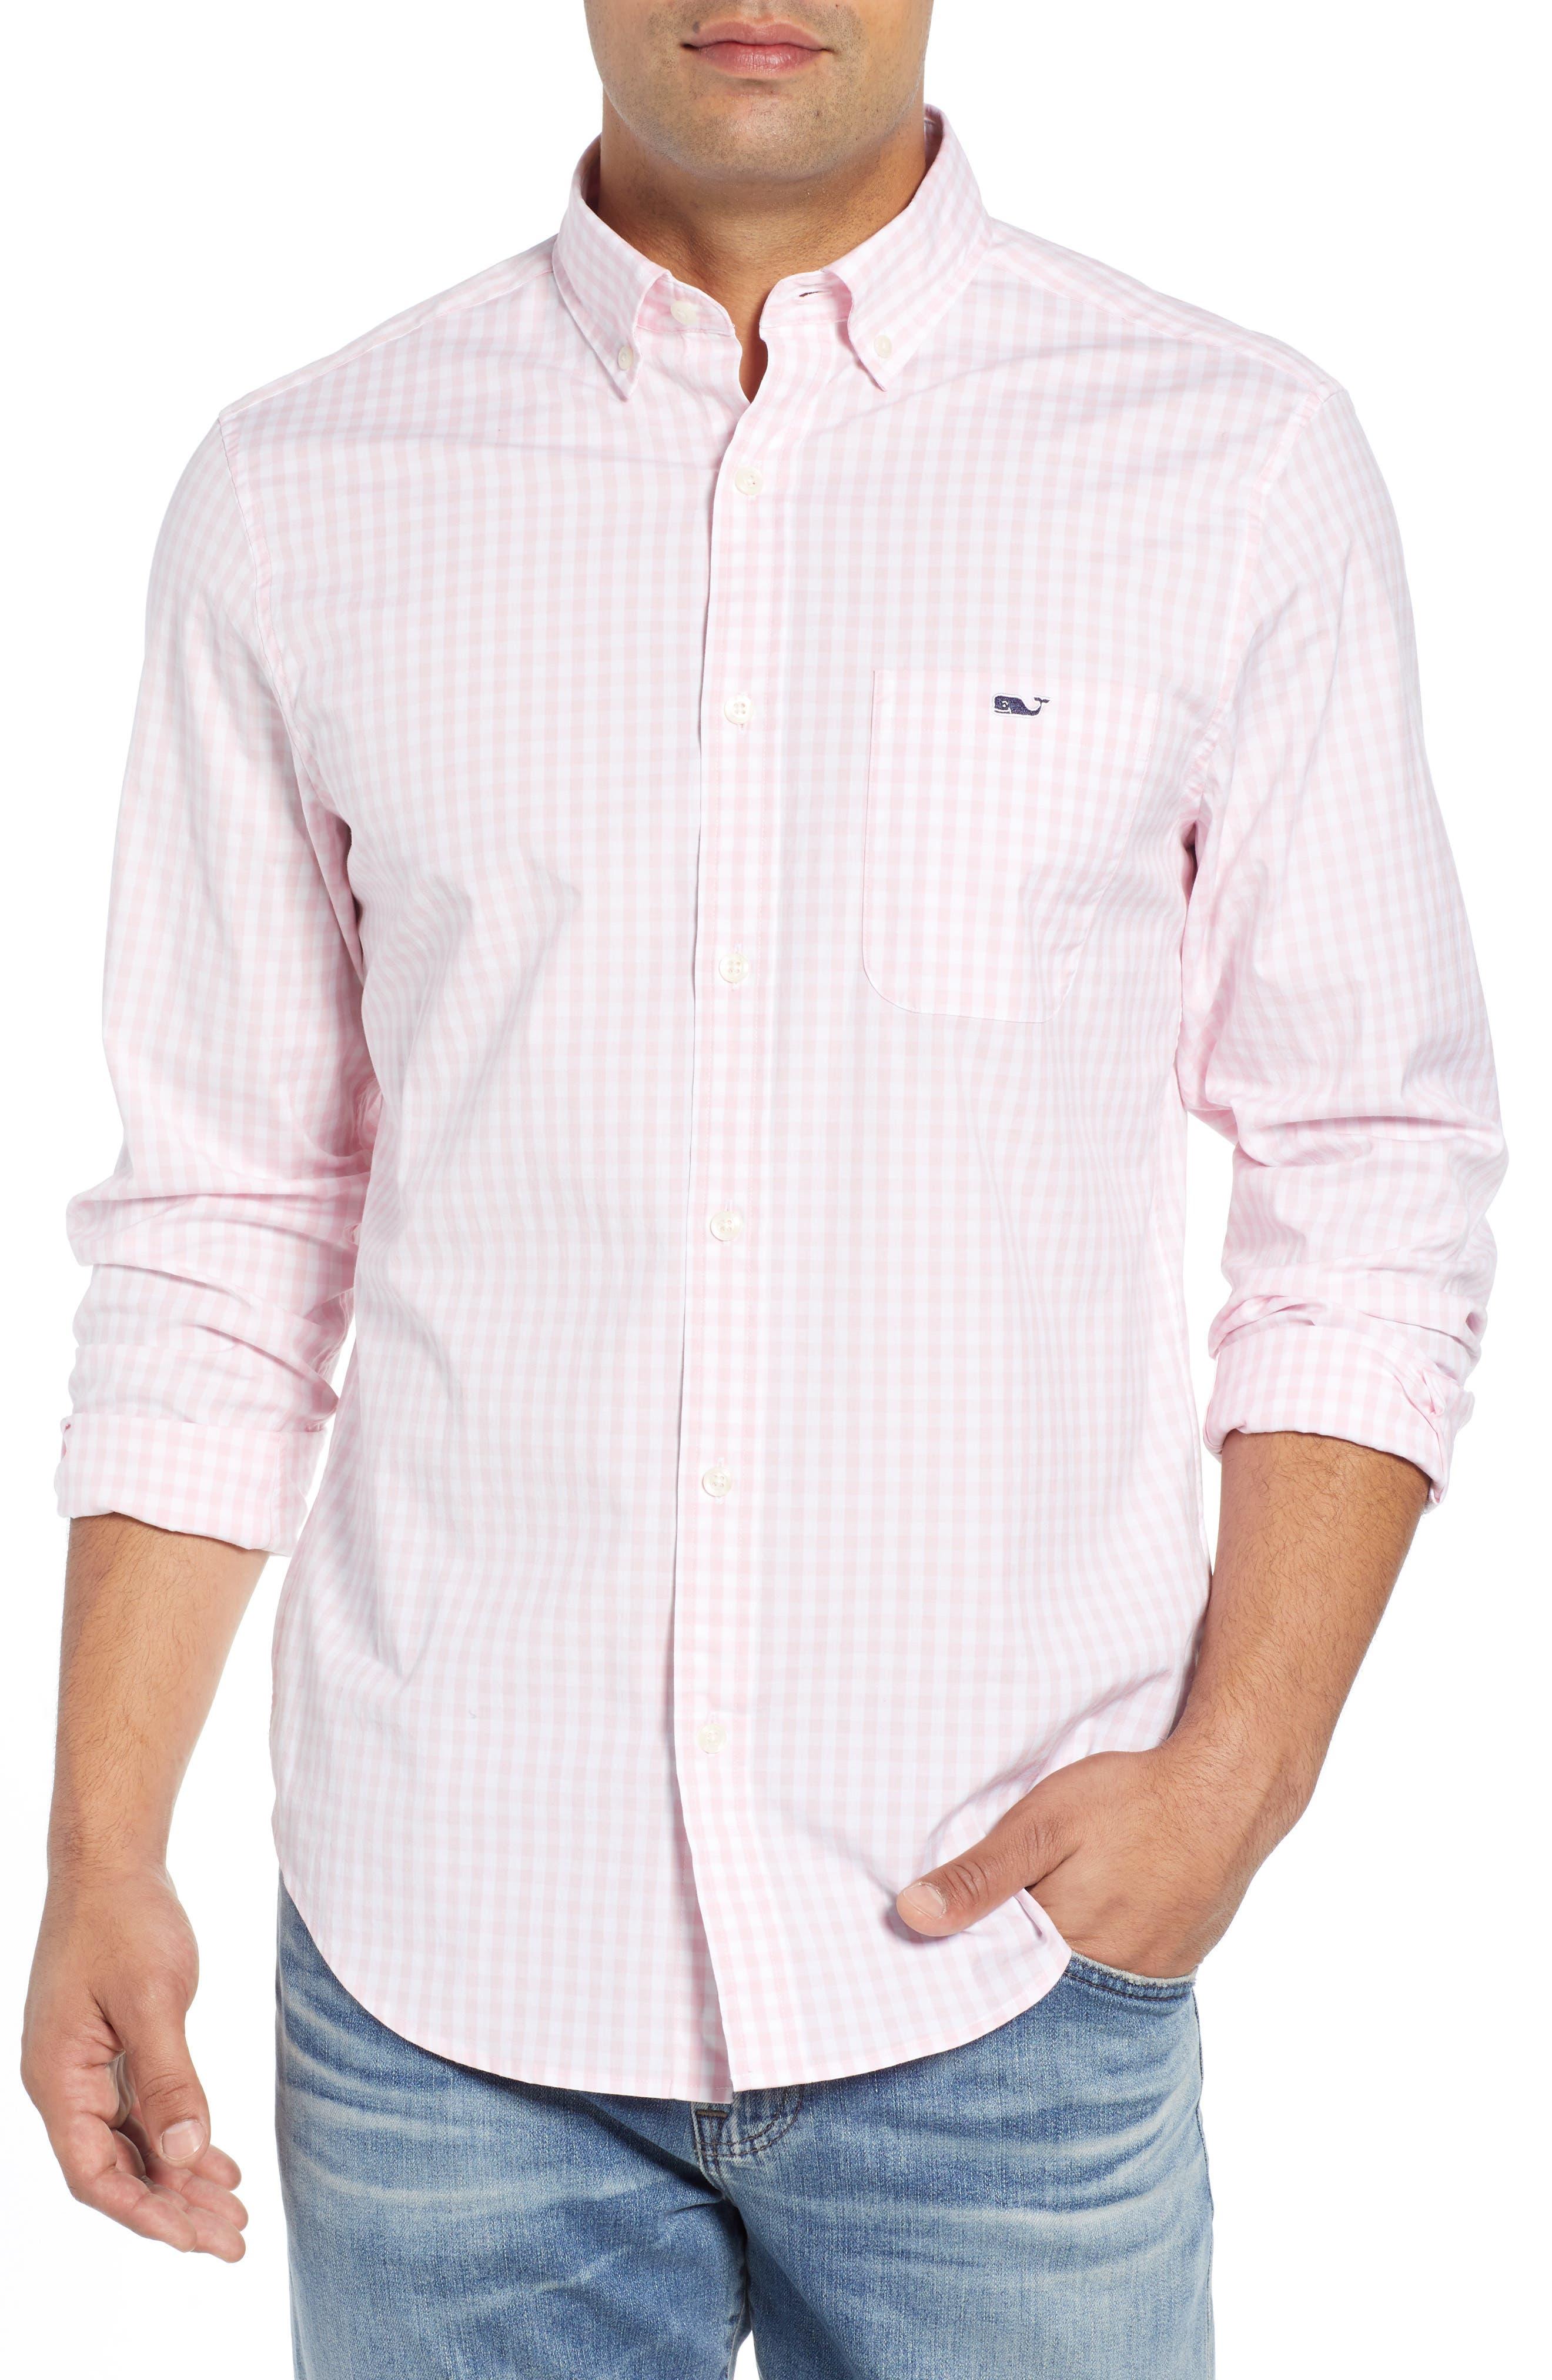 Carleton Classic Fit Gingham Buttondown Shirt,                             Main thumbnail 1, color,                             FLAMINGO